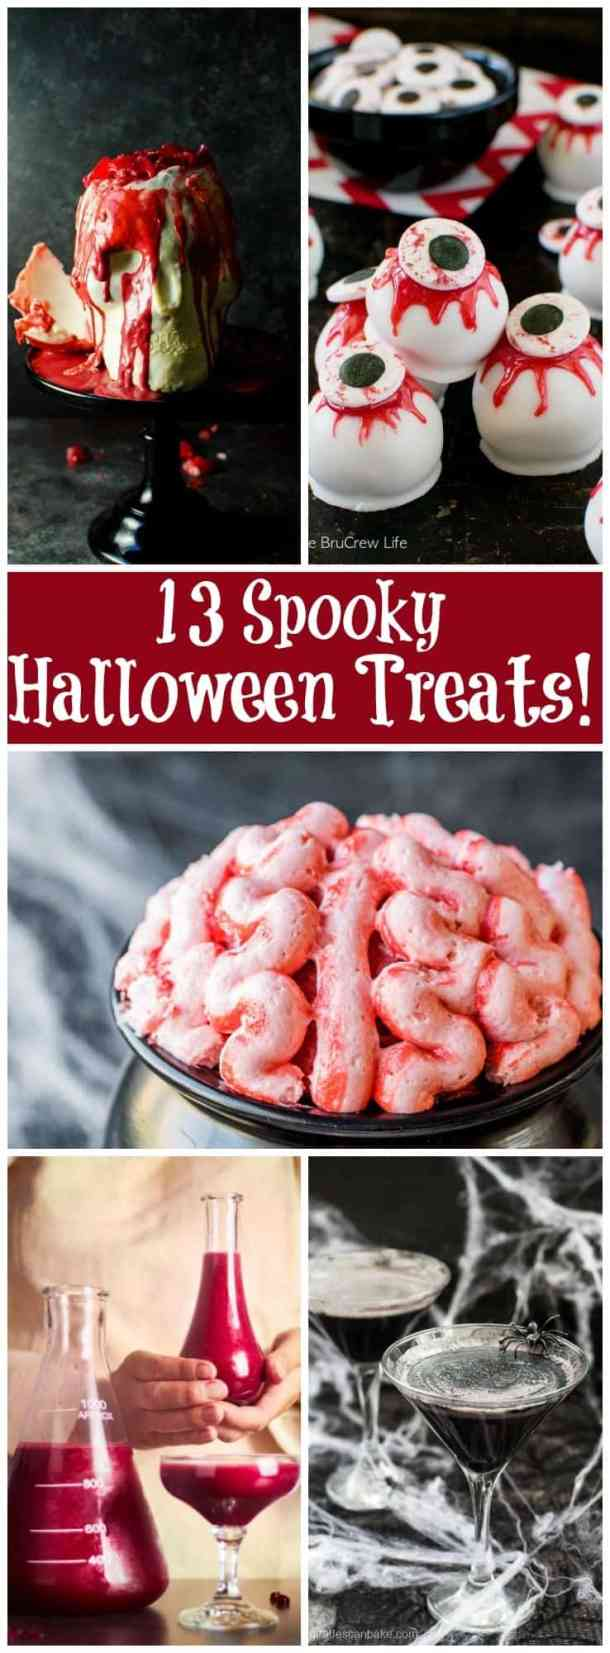 Spooky Treats for Halloween. From unicornsinthekitchen.com